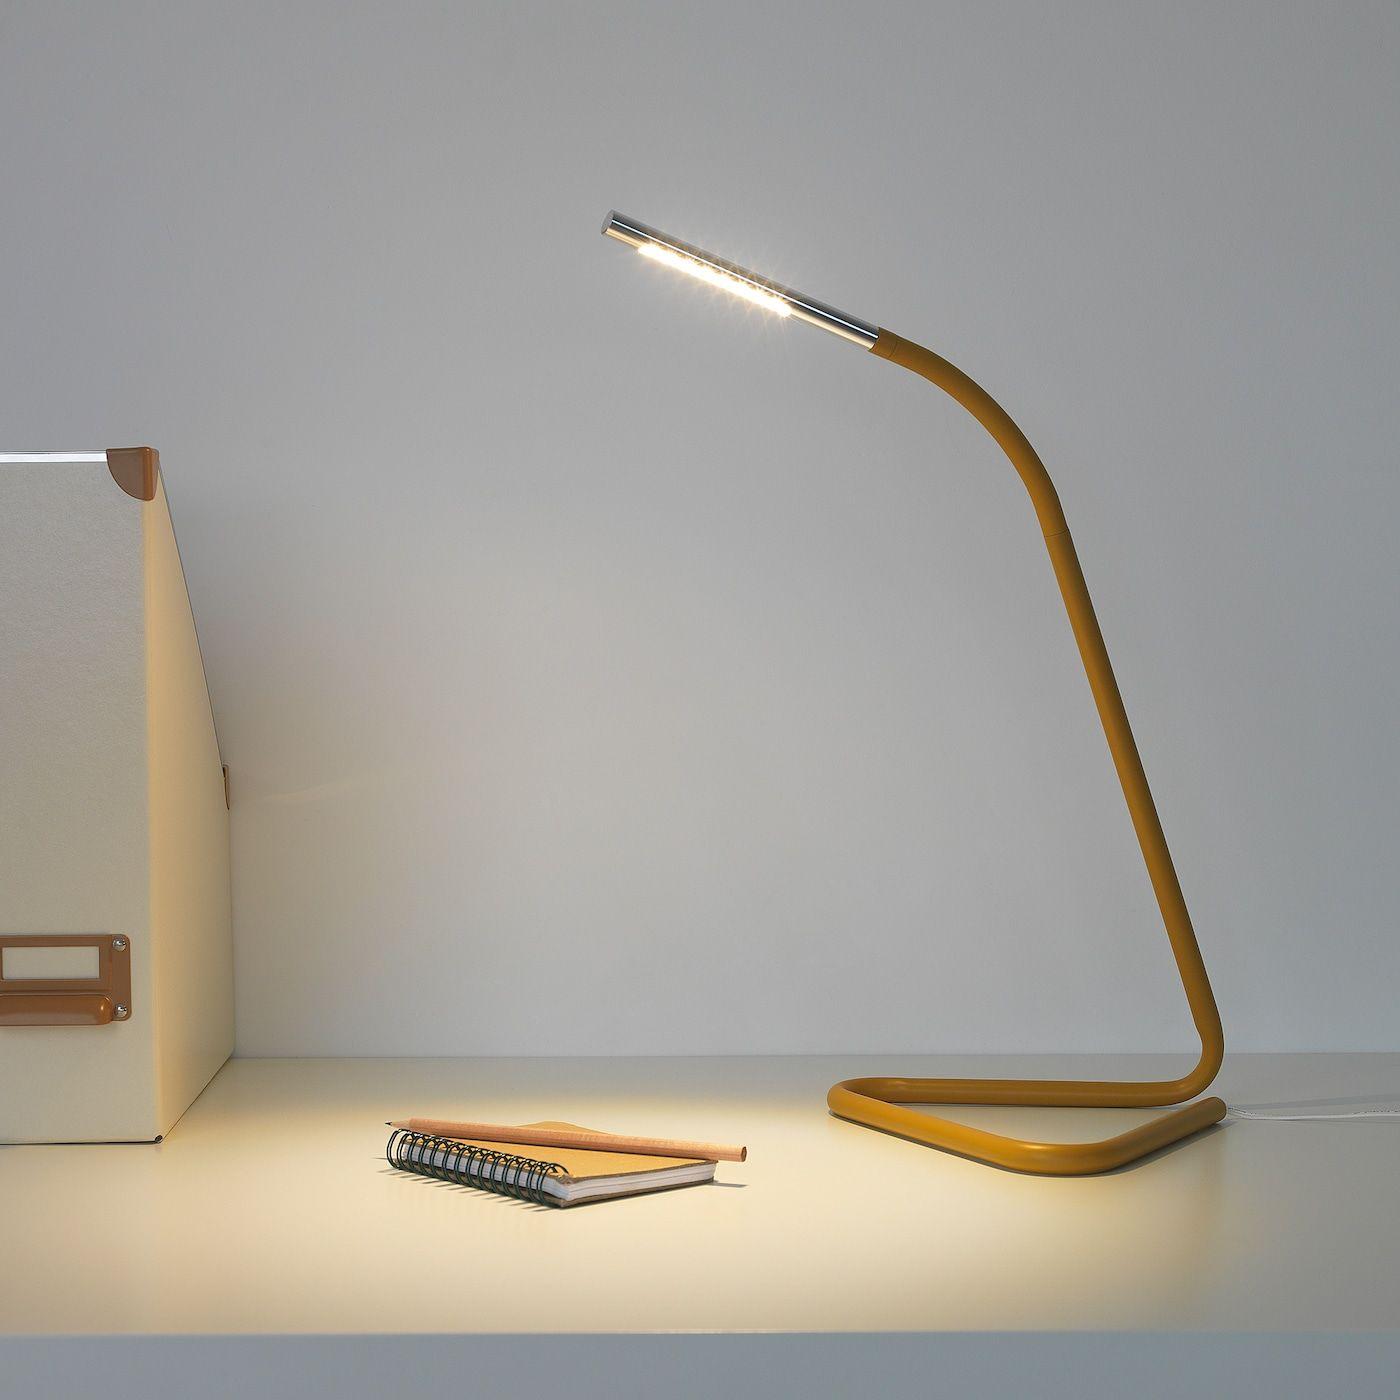 Harte Arbeitsleuchte Led Gelb Silberfarben Ikea Osterreich In 2020 Work Lamp Lamp Can Lights